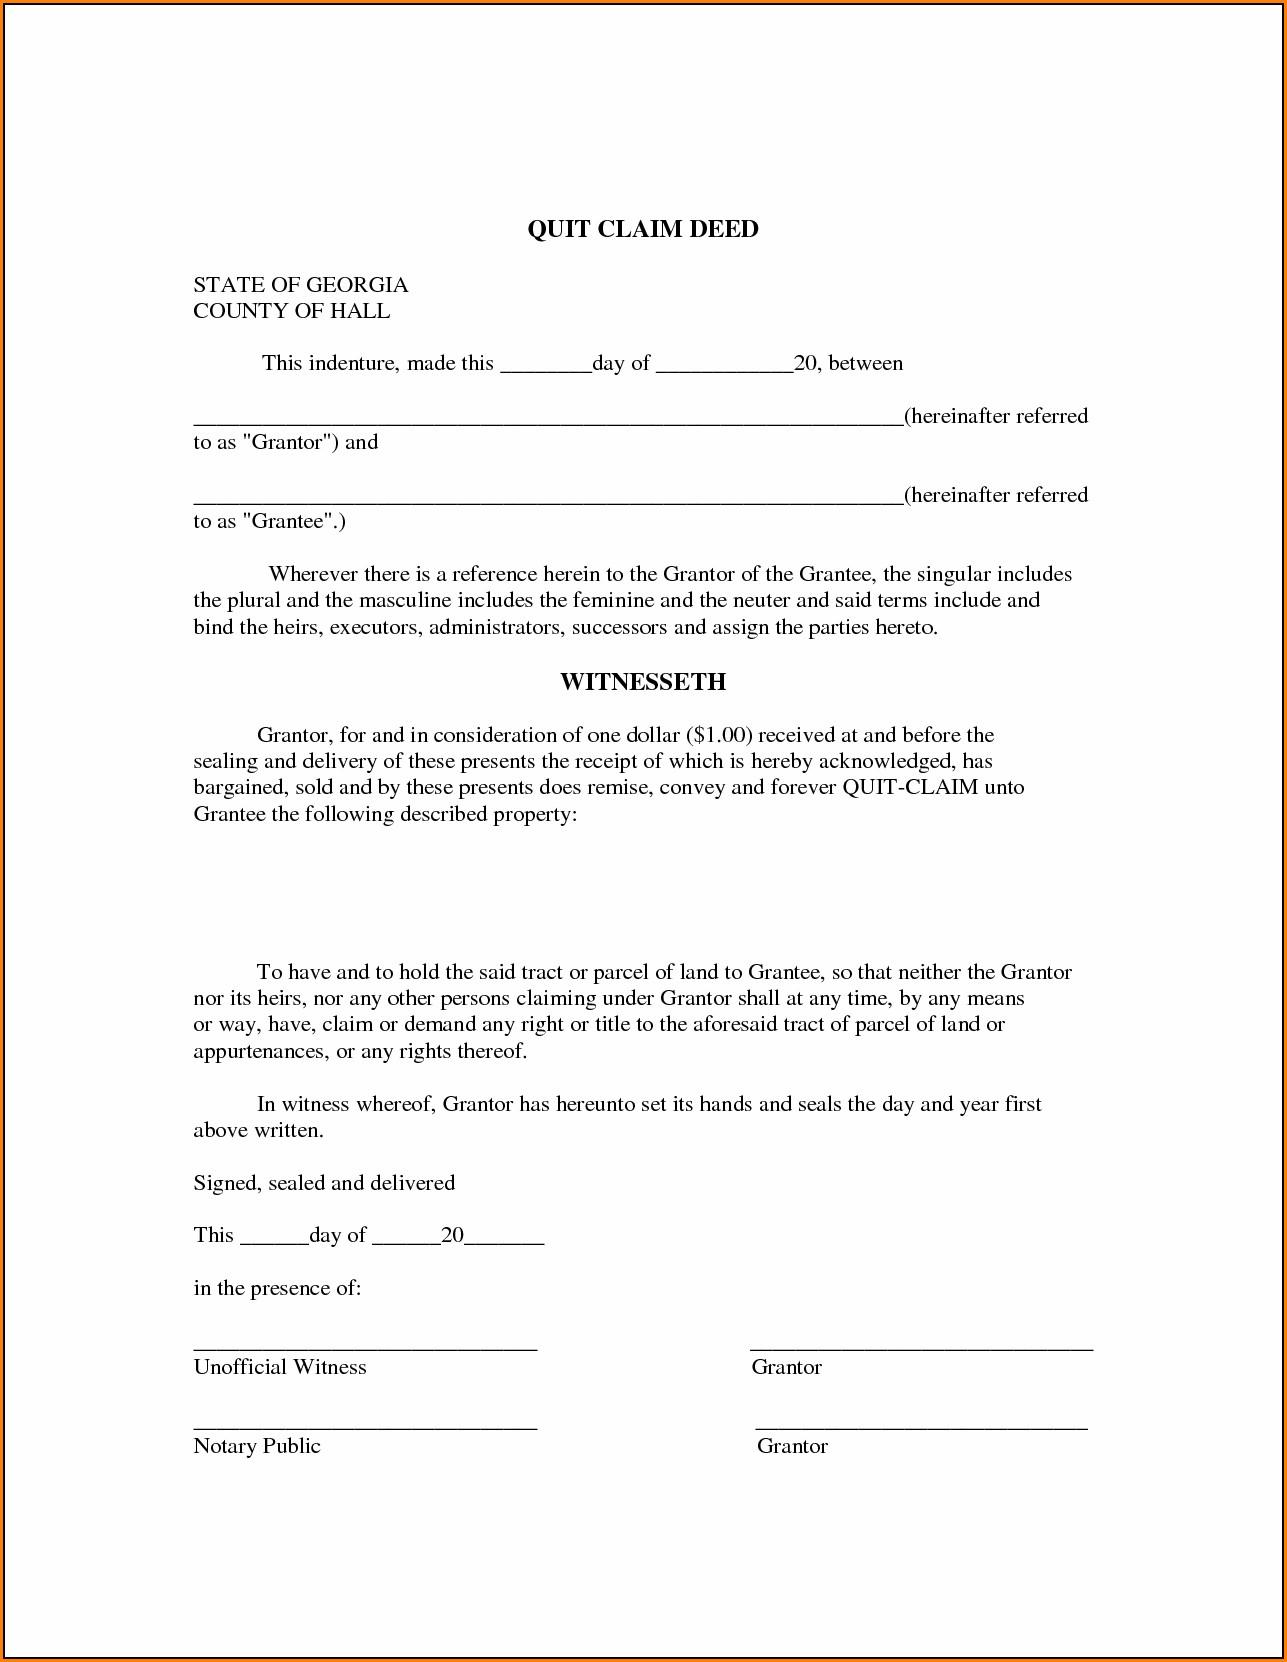 Quick Claim Deed Form Georgia